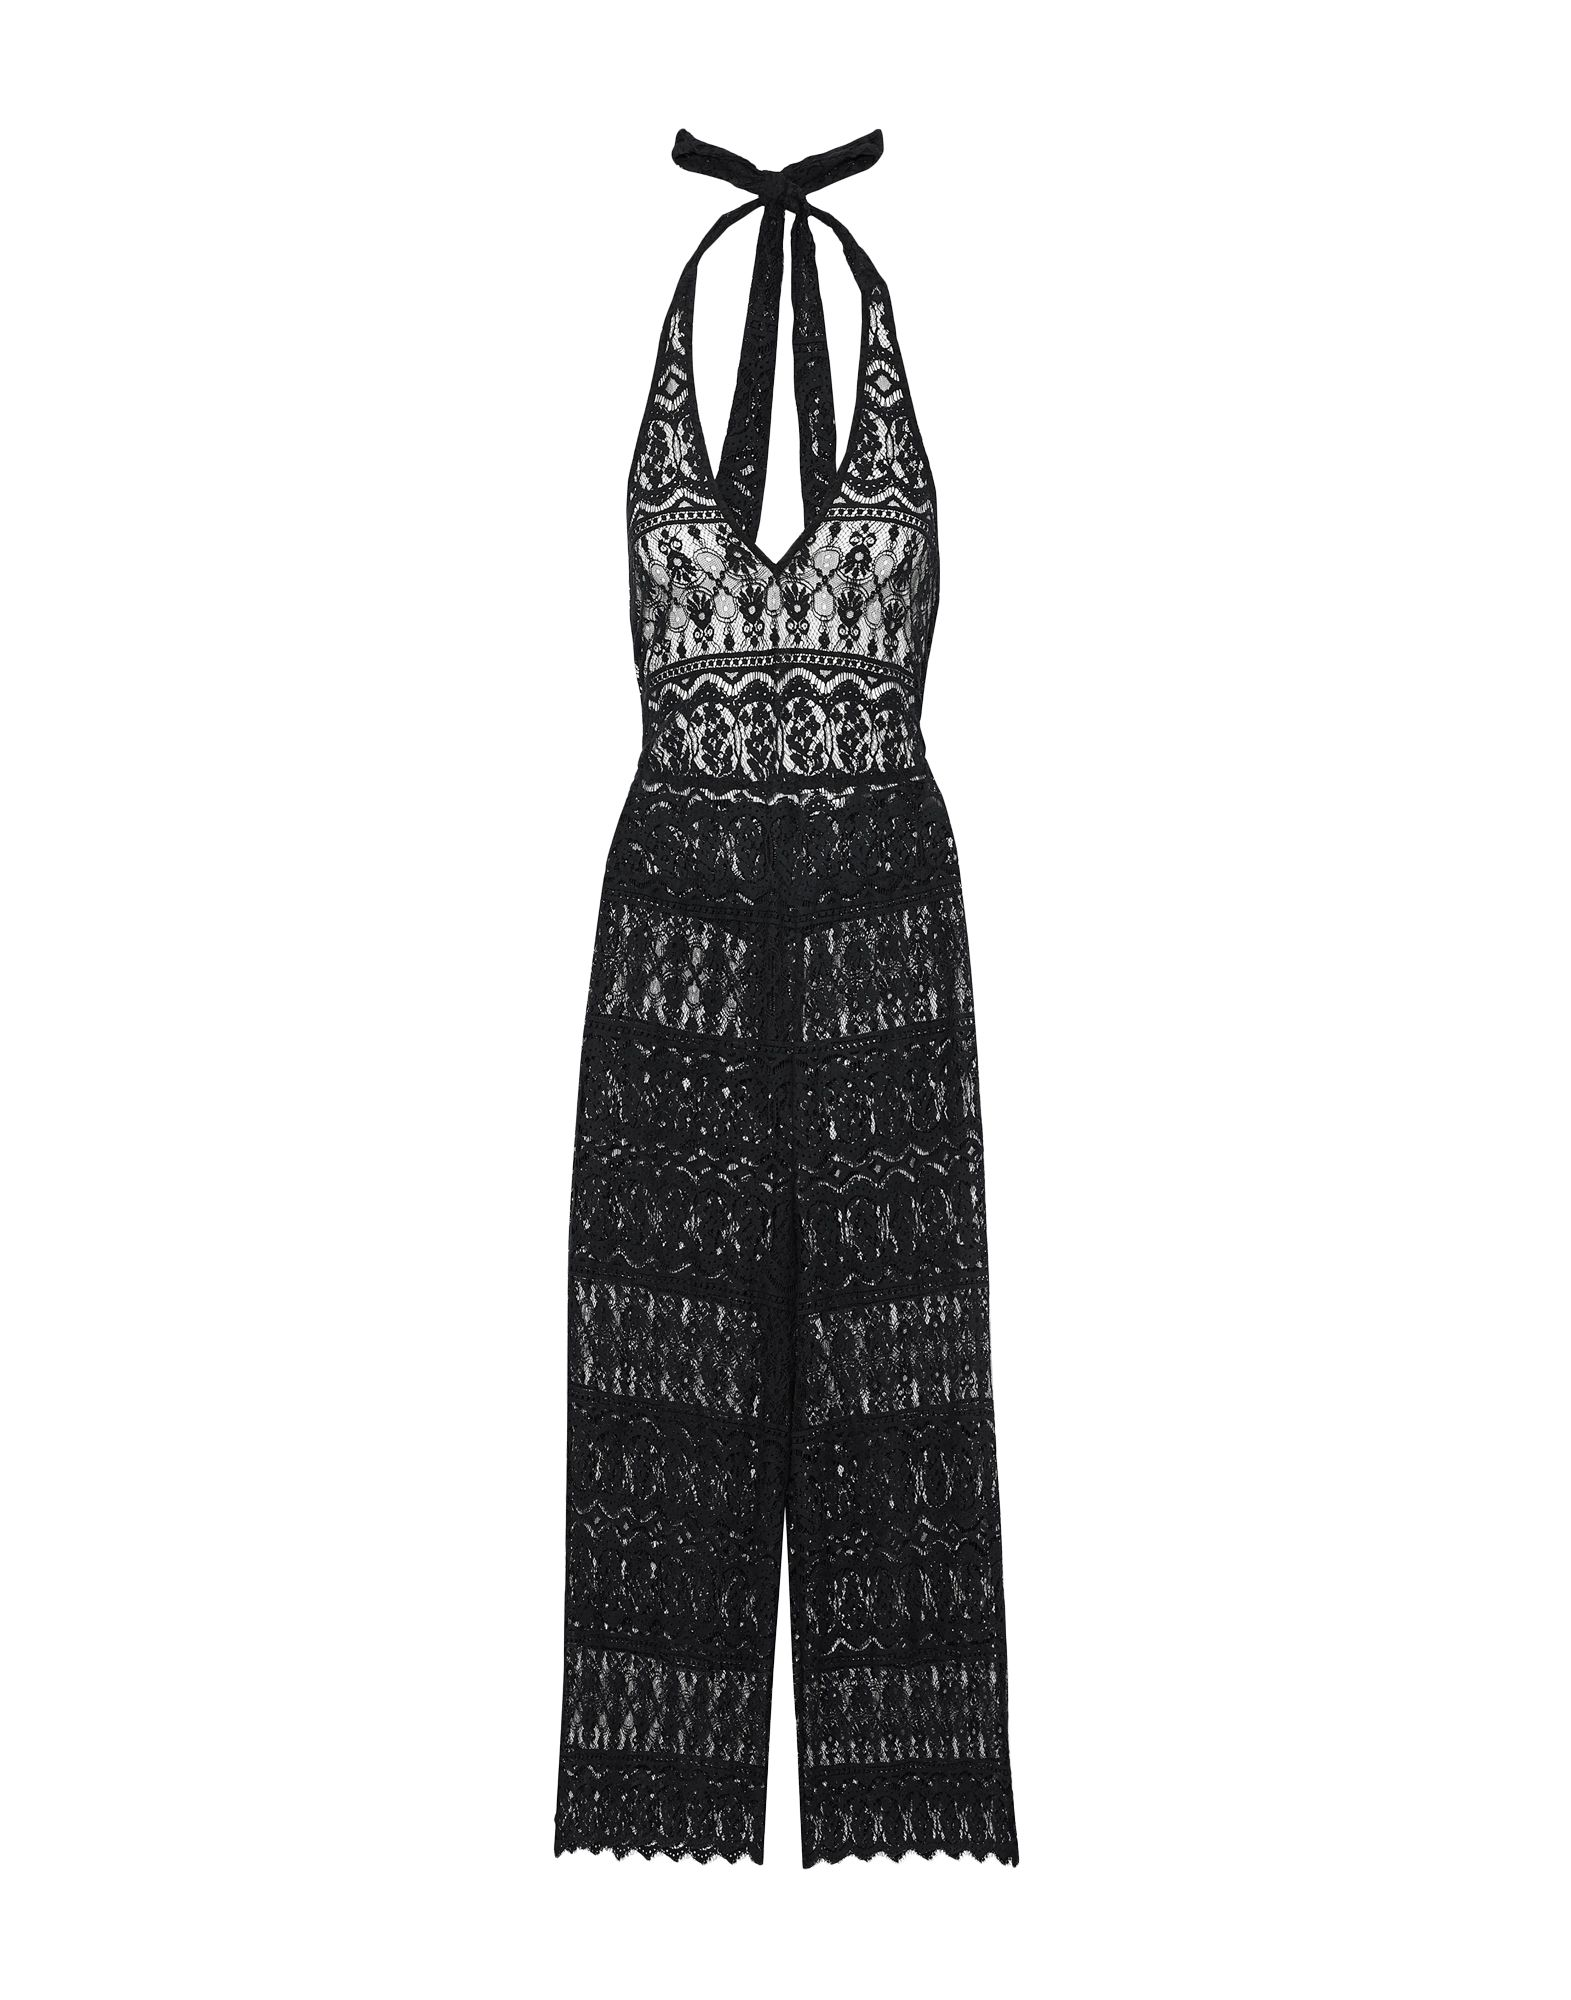 ALICE + OLIVIA Overalls. lace, no appliqués, basic solid color, v-neck, sleeveless, no pockets, zip, rear closure. 85% Cotton, 15% Nylon